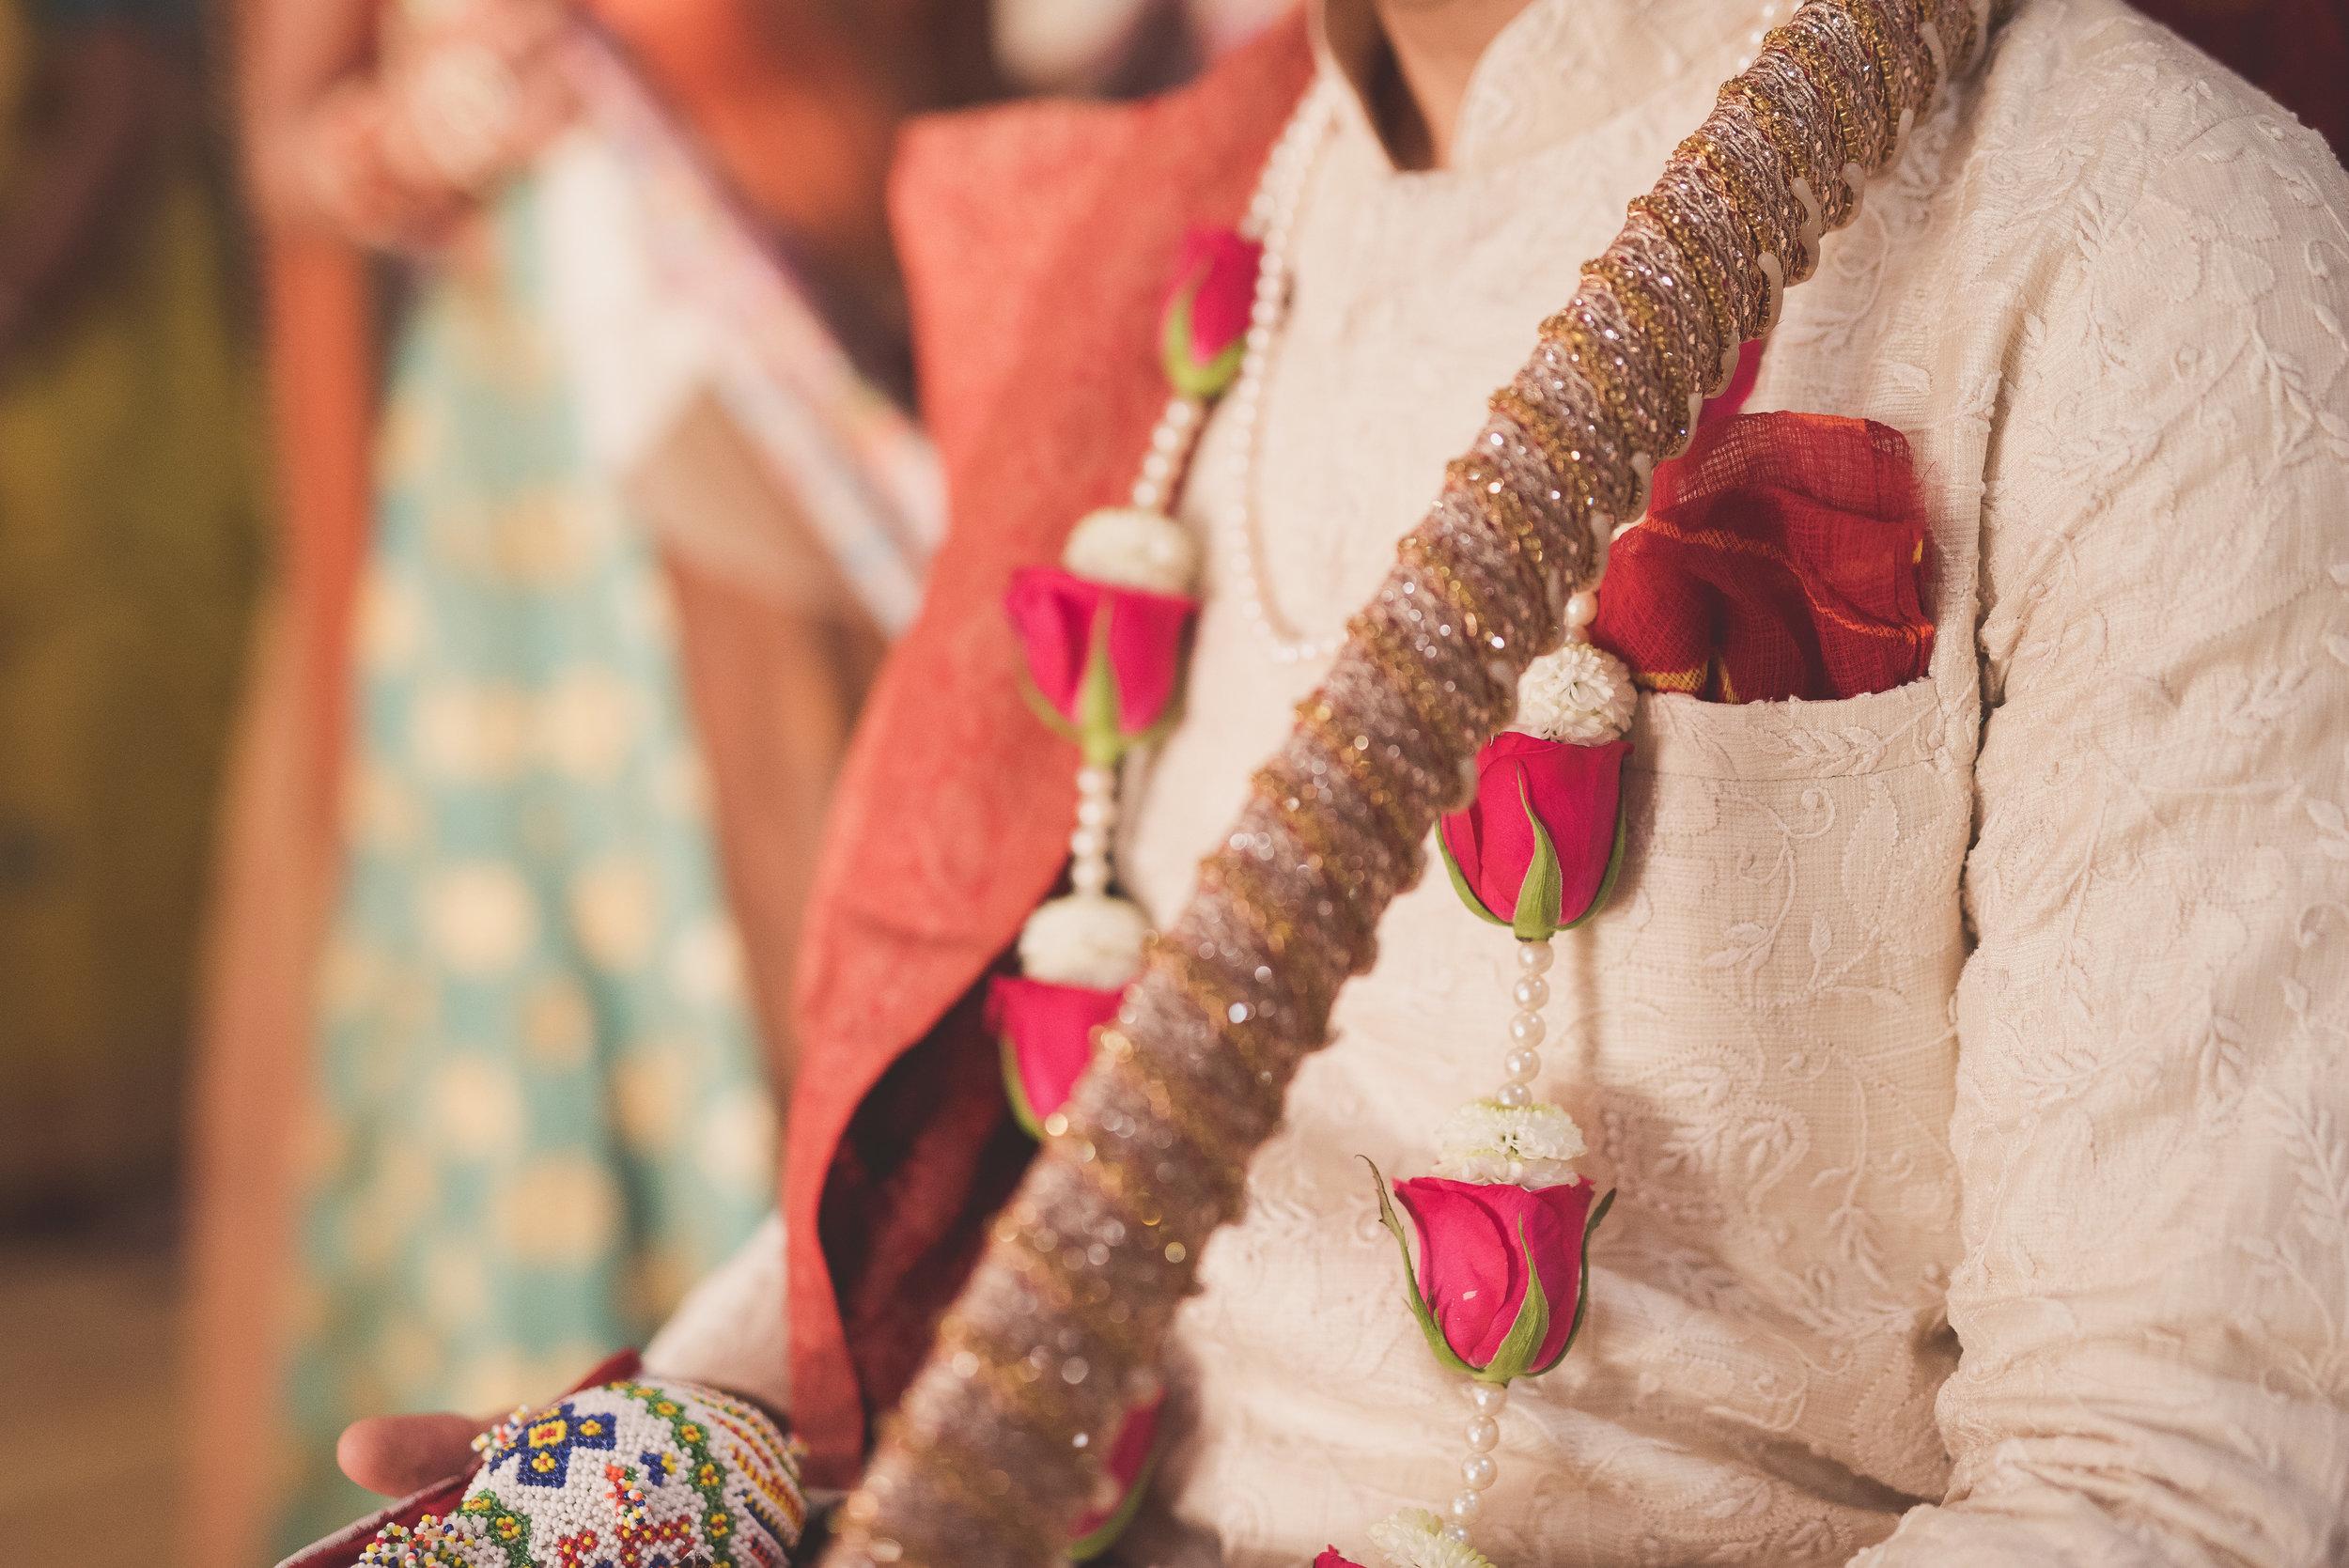 Groom's ceremony at Shree Swaminarayan Temple before wedding ceremony at Oshwal Centre.